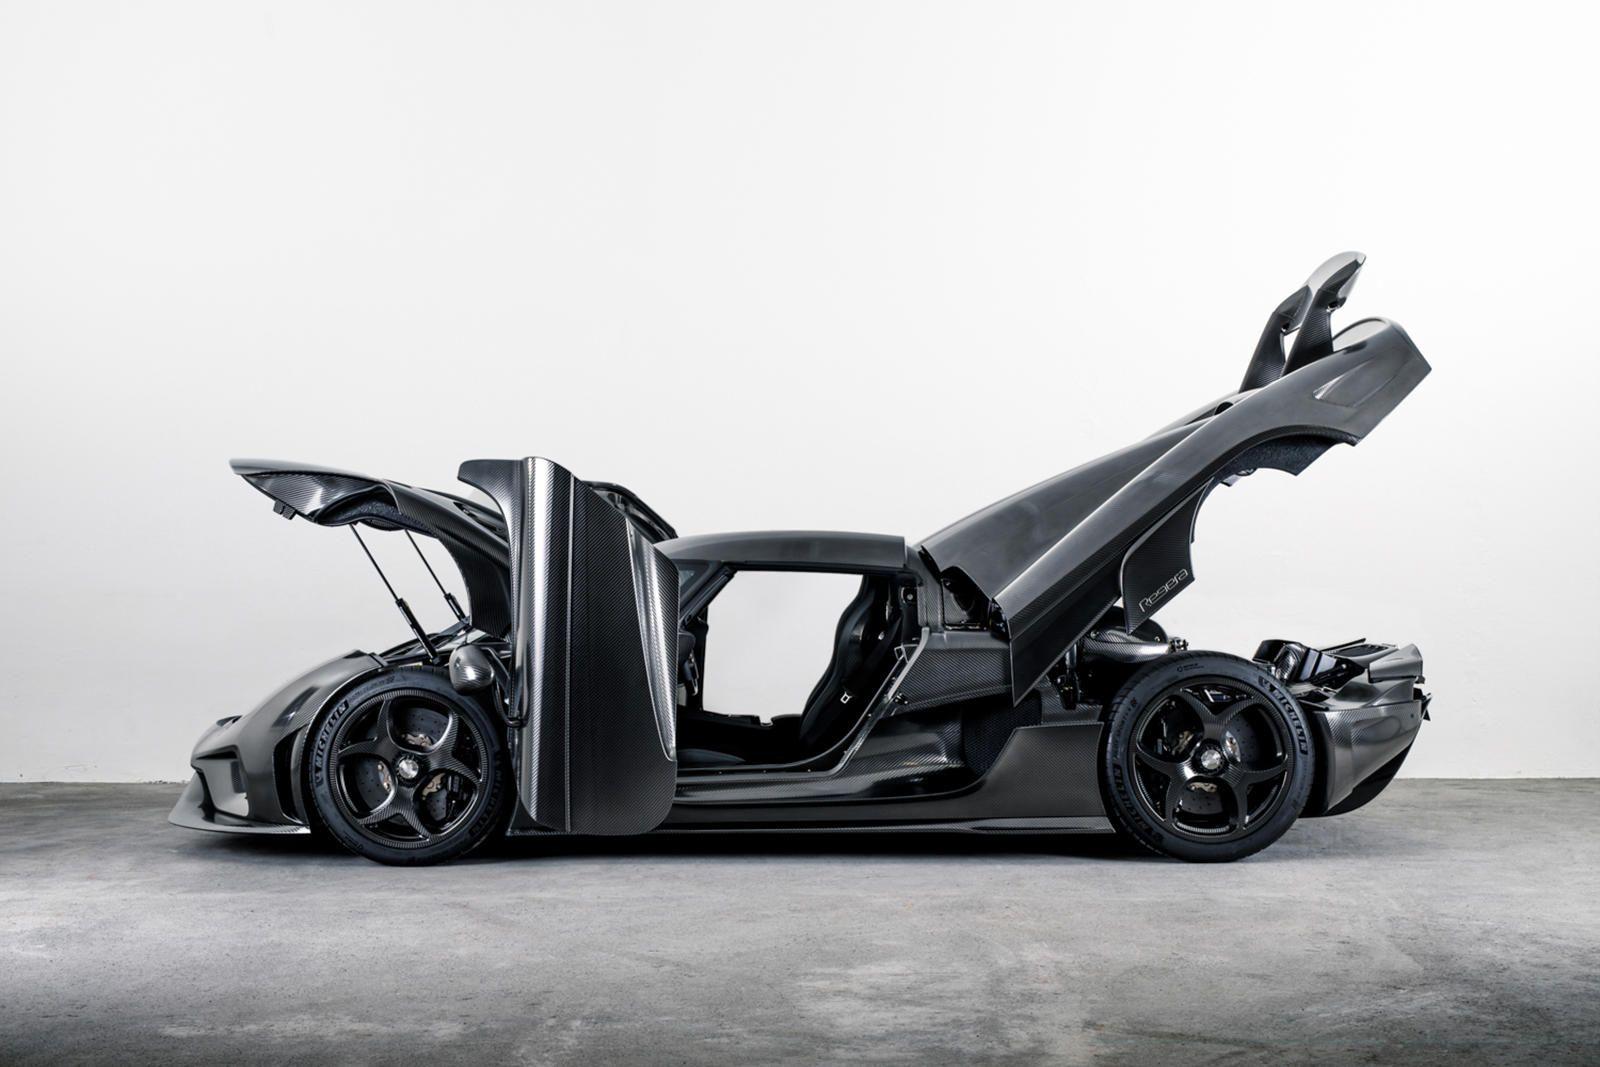 New Koenigsegg 1 500 Hp Supercar Isn T What You Re Expecting In 2020 Koenigsegg Super Cars Carbon Fiber